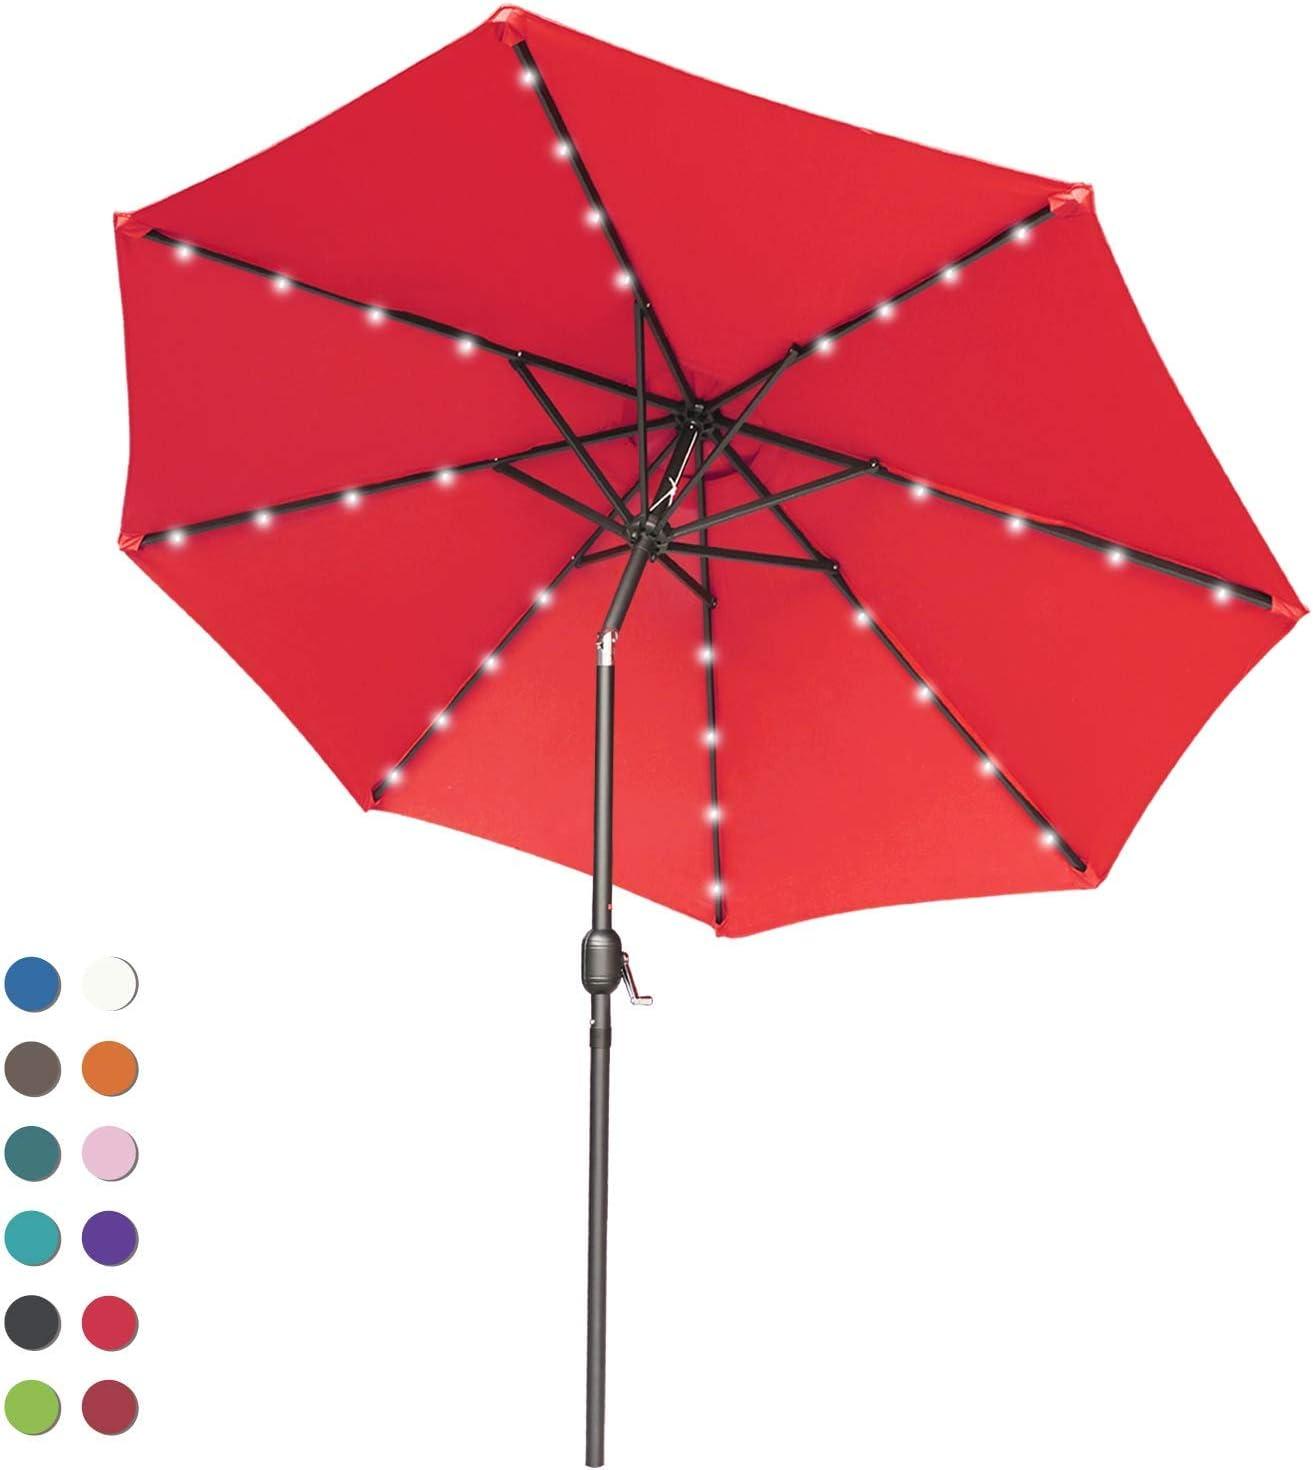 ABCCANOPY Patio Umbrella Ourdoor Solar Umbrella LED Umbrellas with 32LED Lights, Tilt and Crank Table Umbrellas for Garden, Deck, Backyard and Pool,12+Colors, (Red)